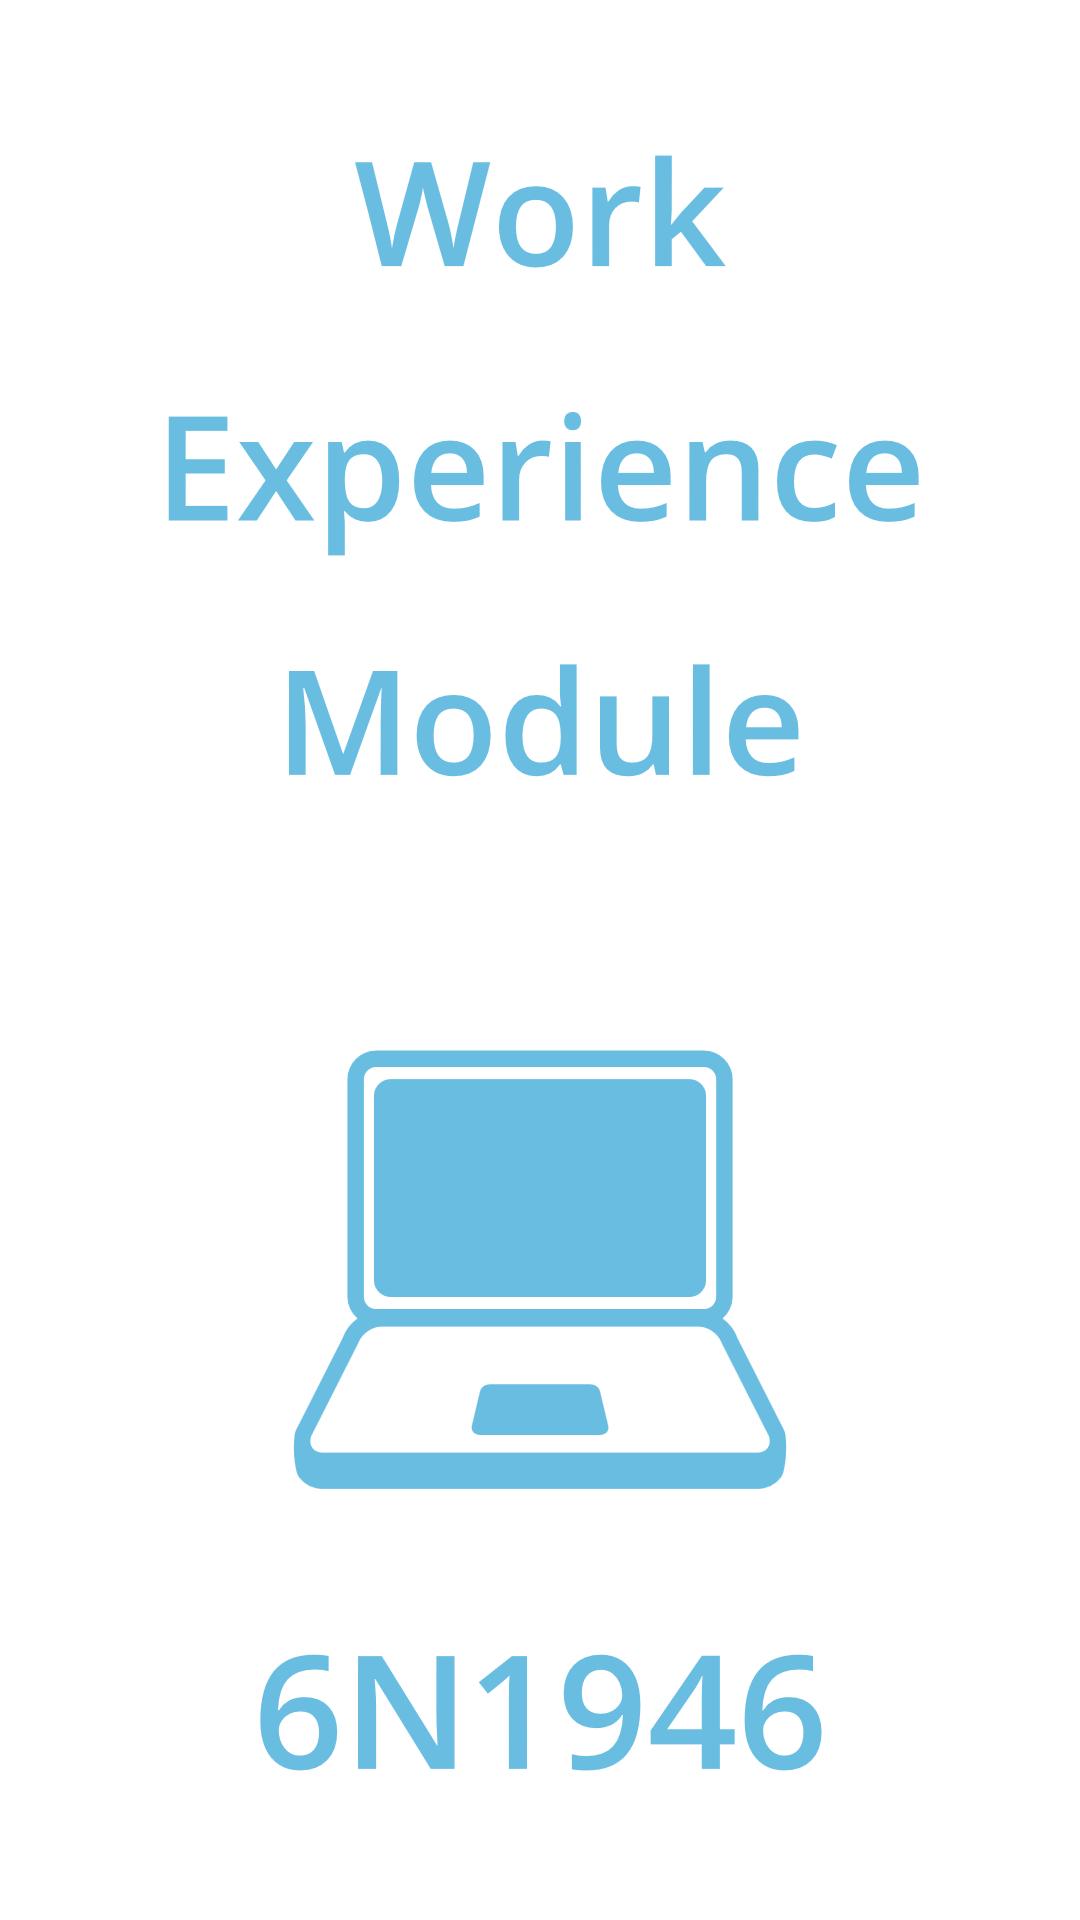 work experience module